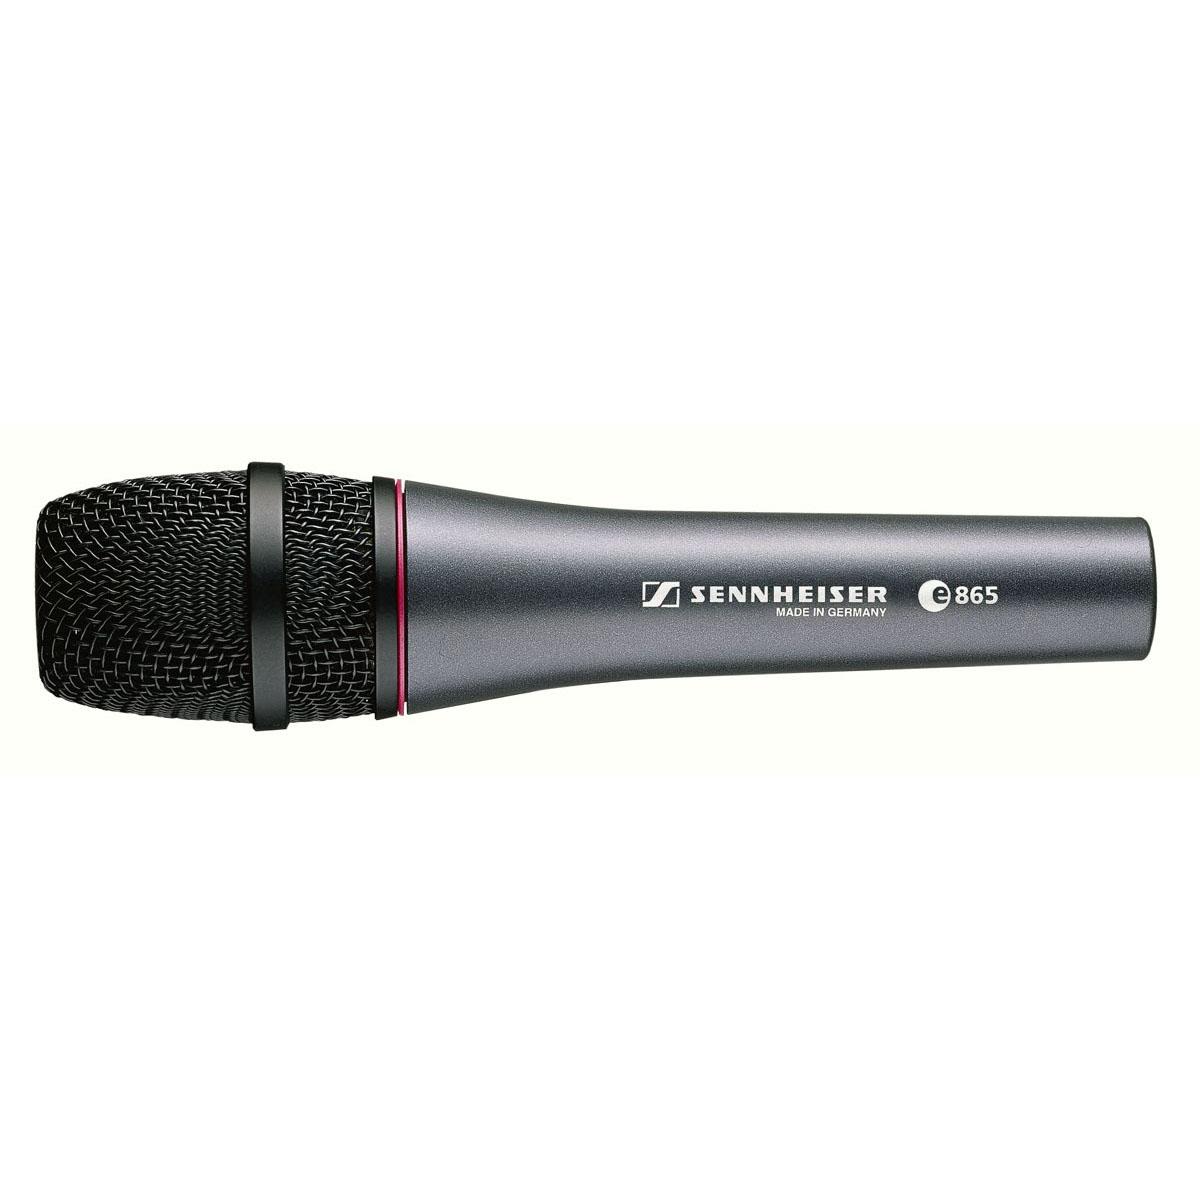 Afbeelding van Sennheiser E 865 zangmicrofoon condensator